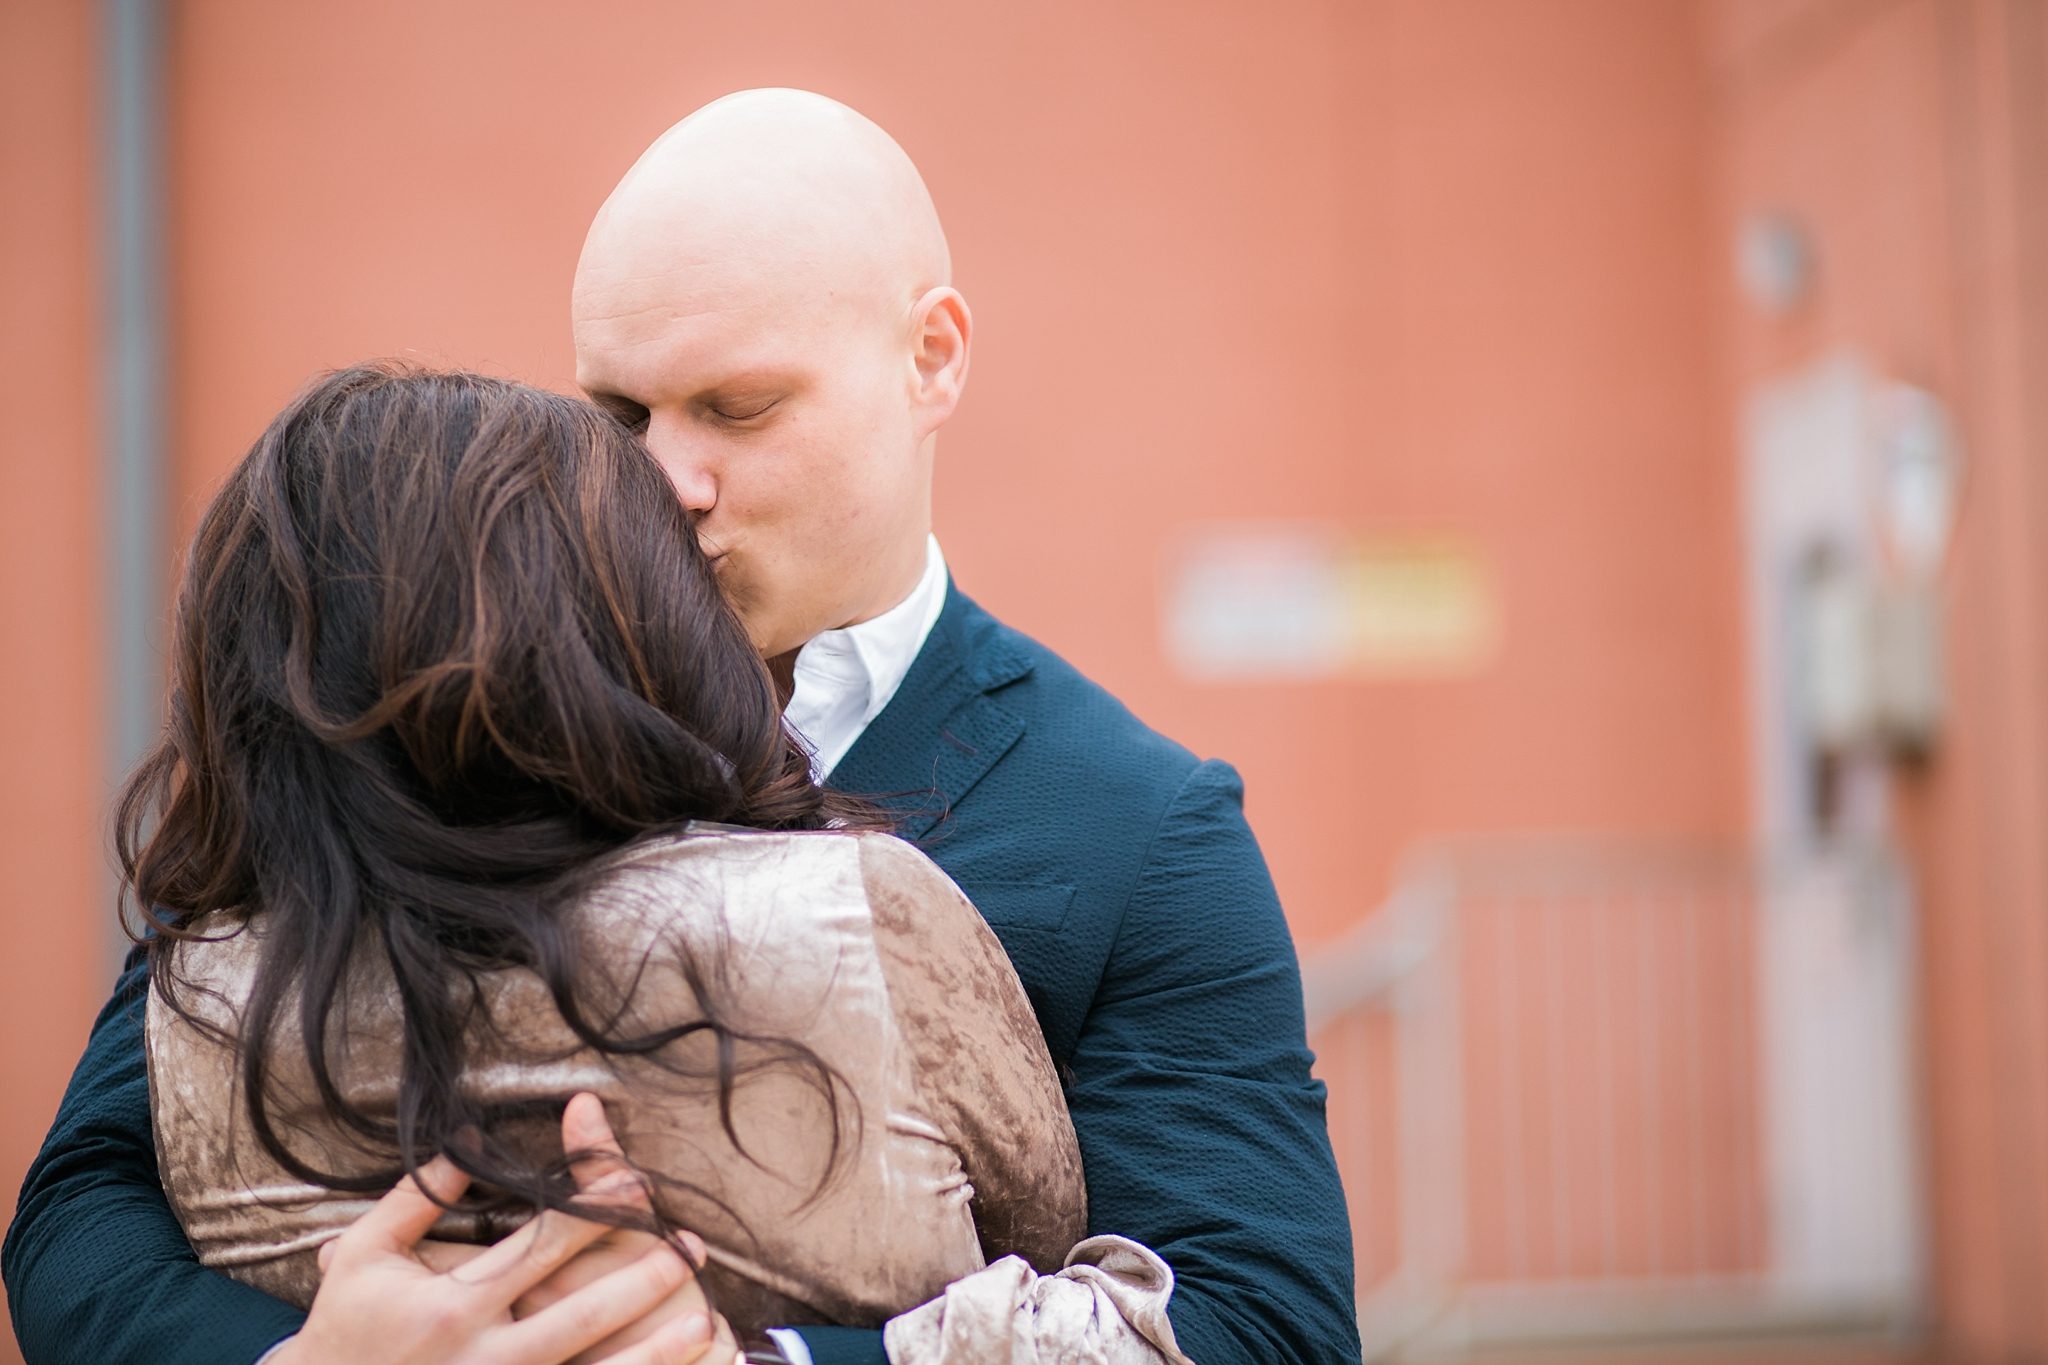 holding-fiance.jpg